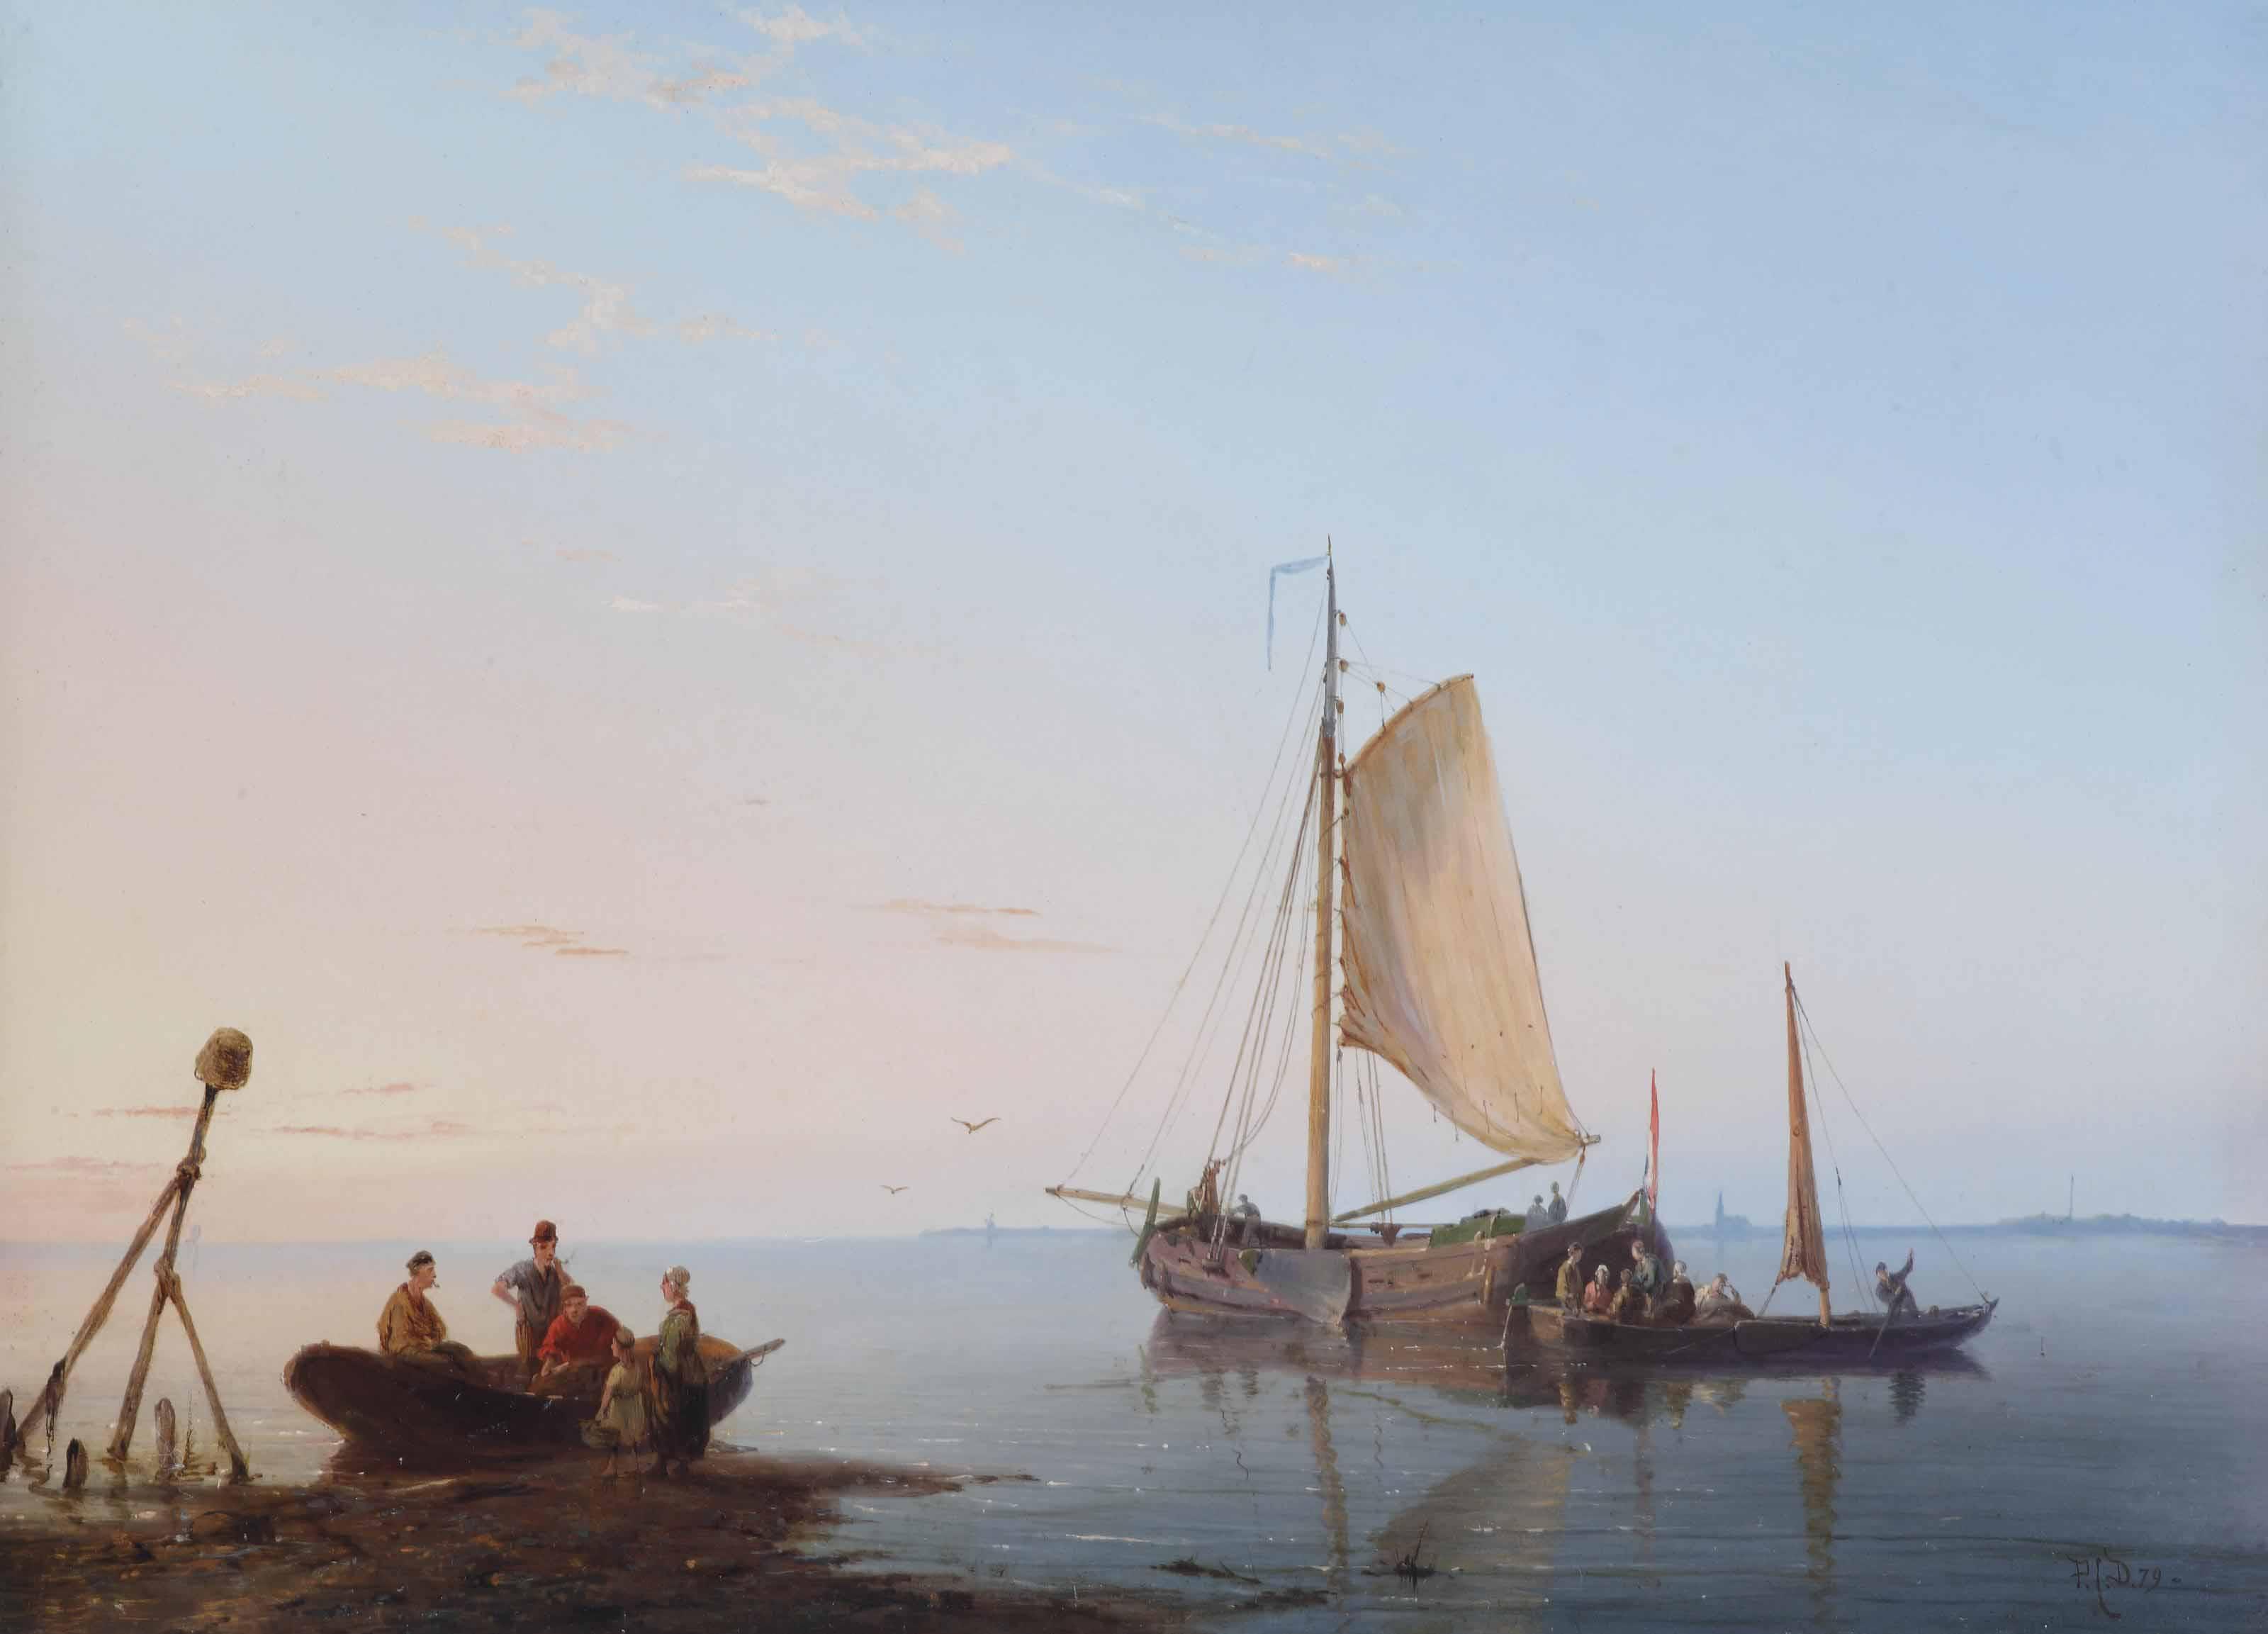 Vessels along the Dutch coast at sunset